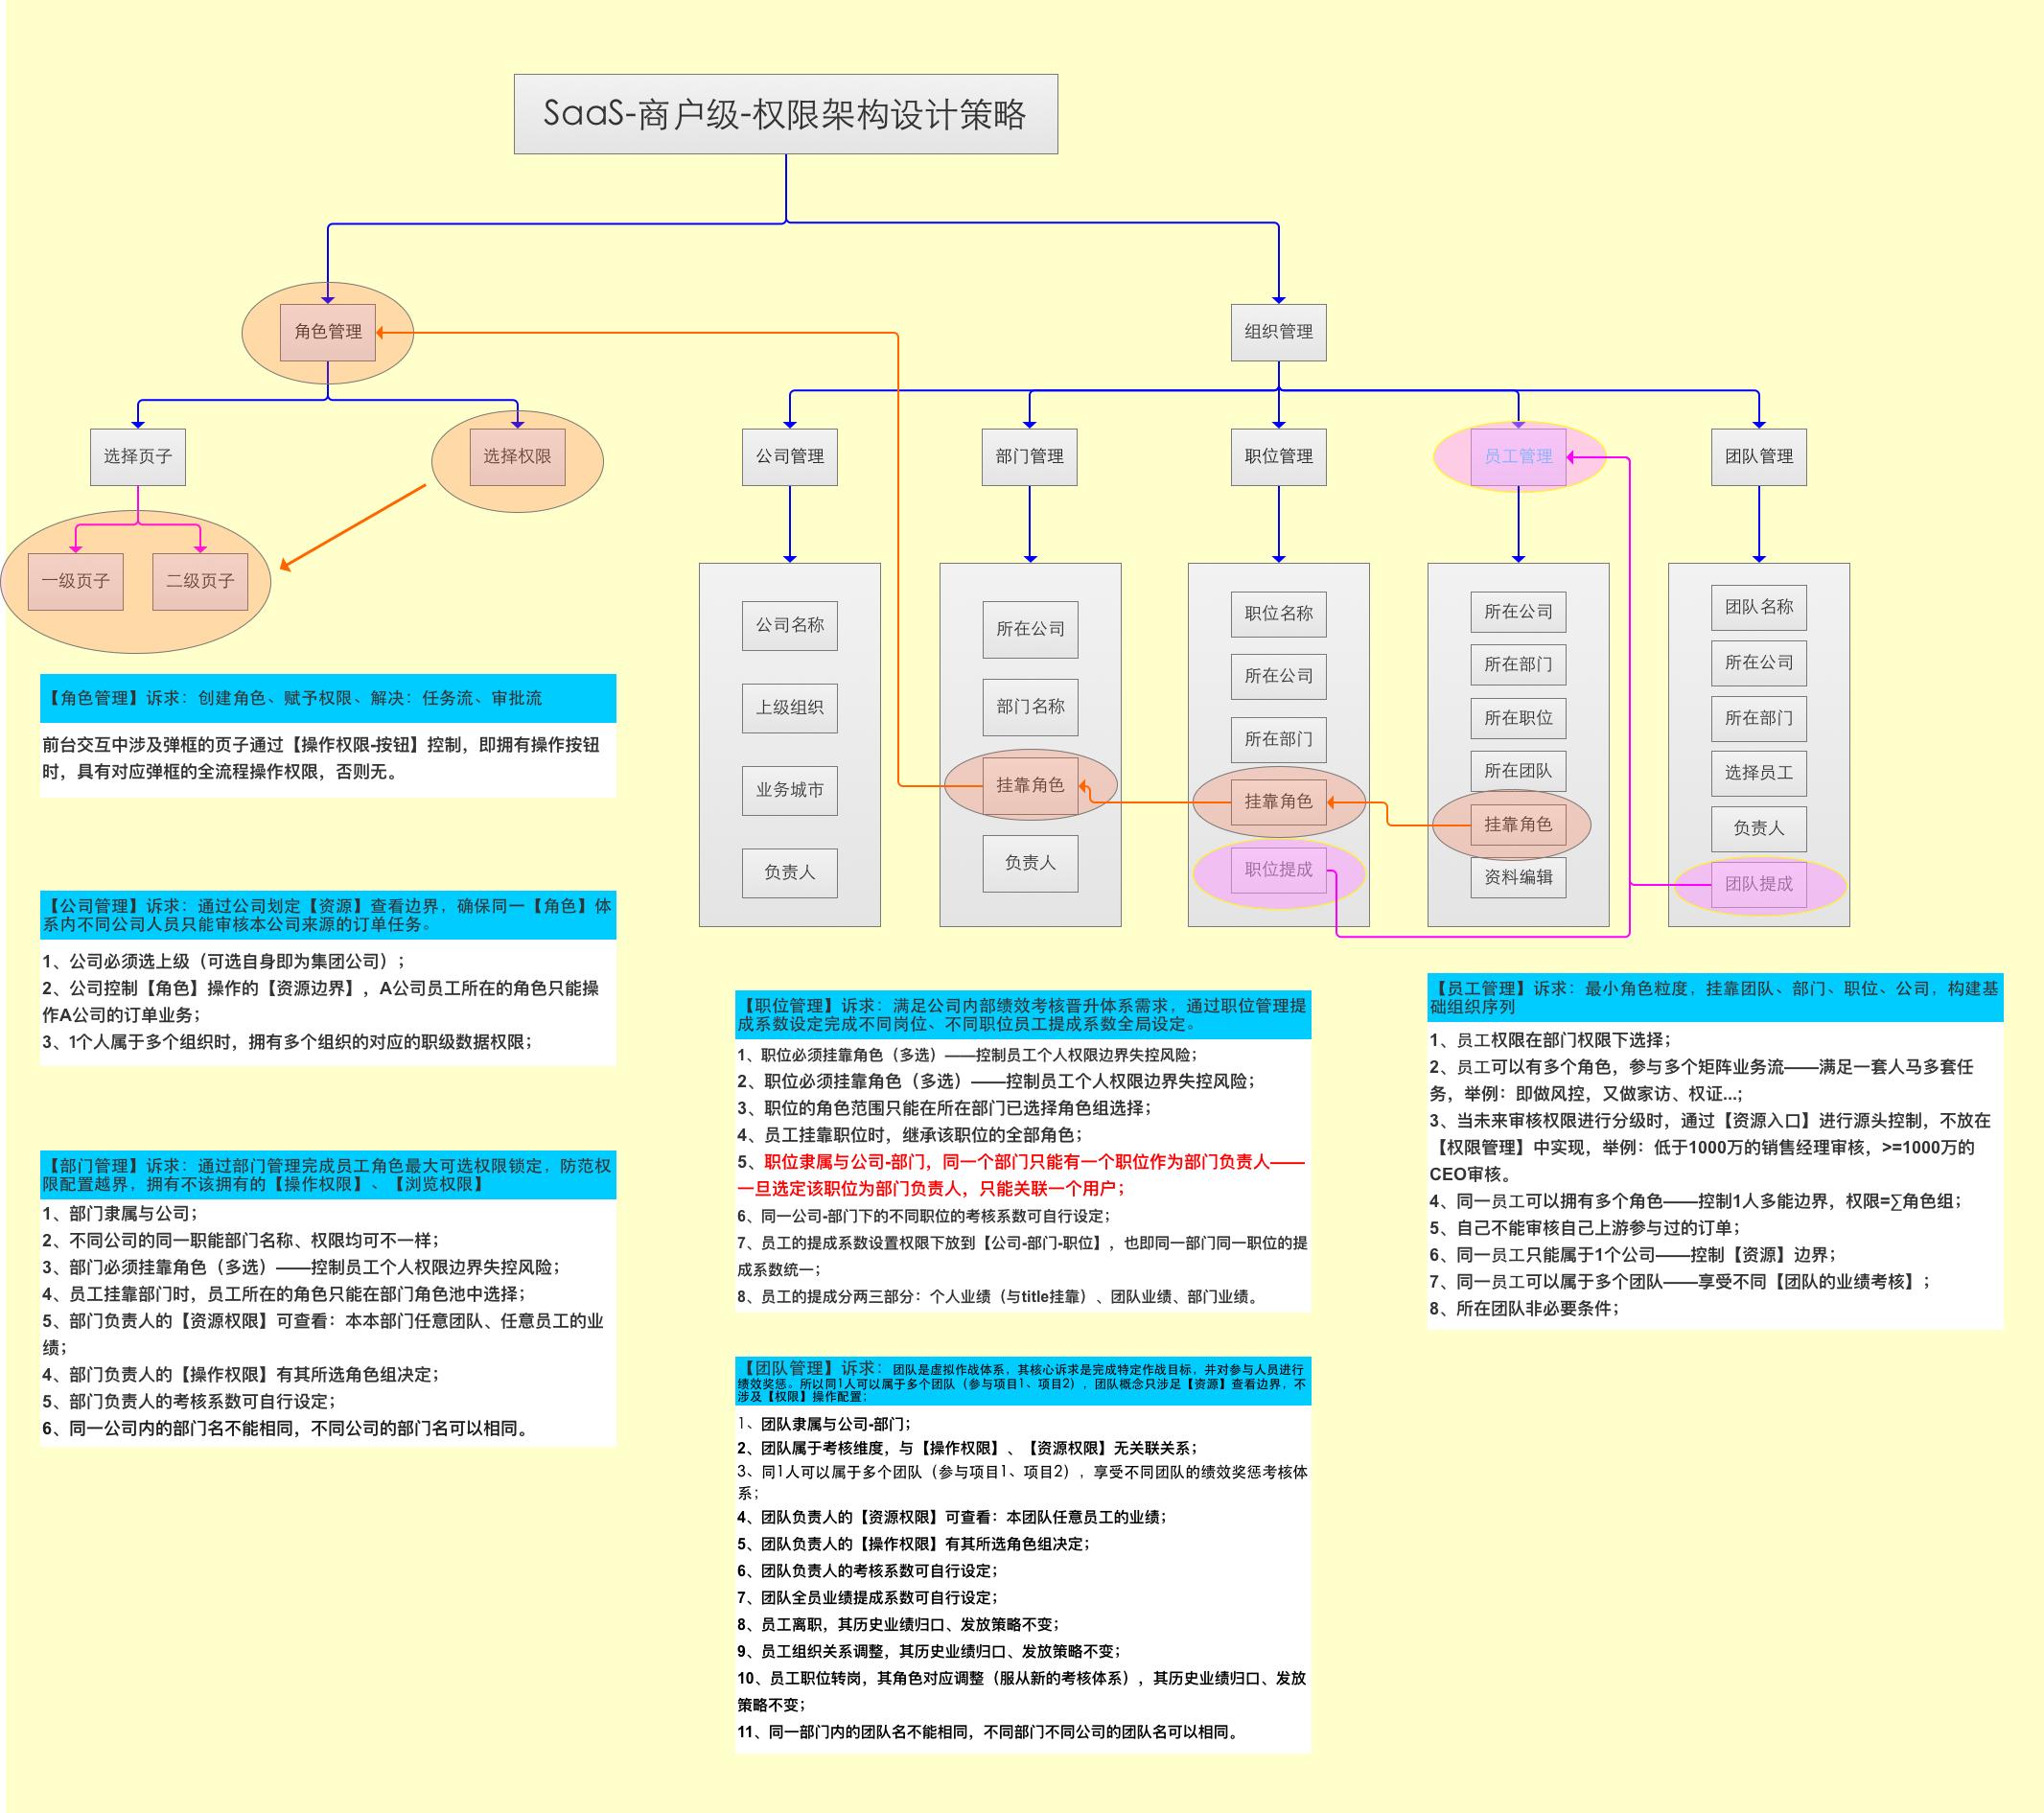 CRM知识解构、策略设计及SaaS体系下的柔性开发实践分享(下篇) 第12张